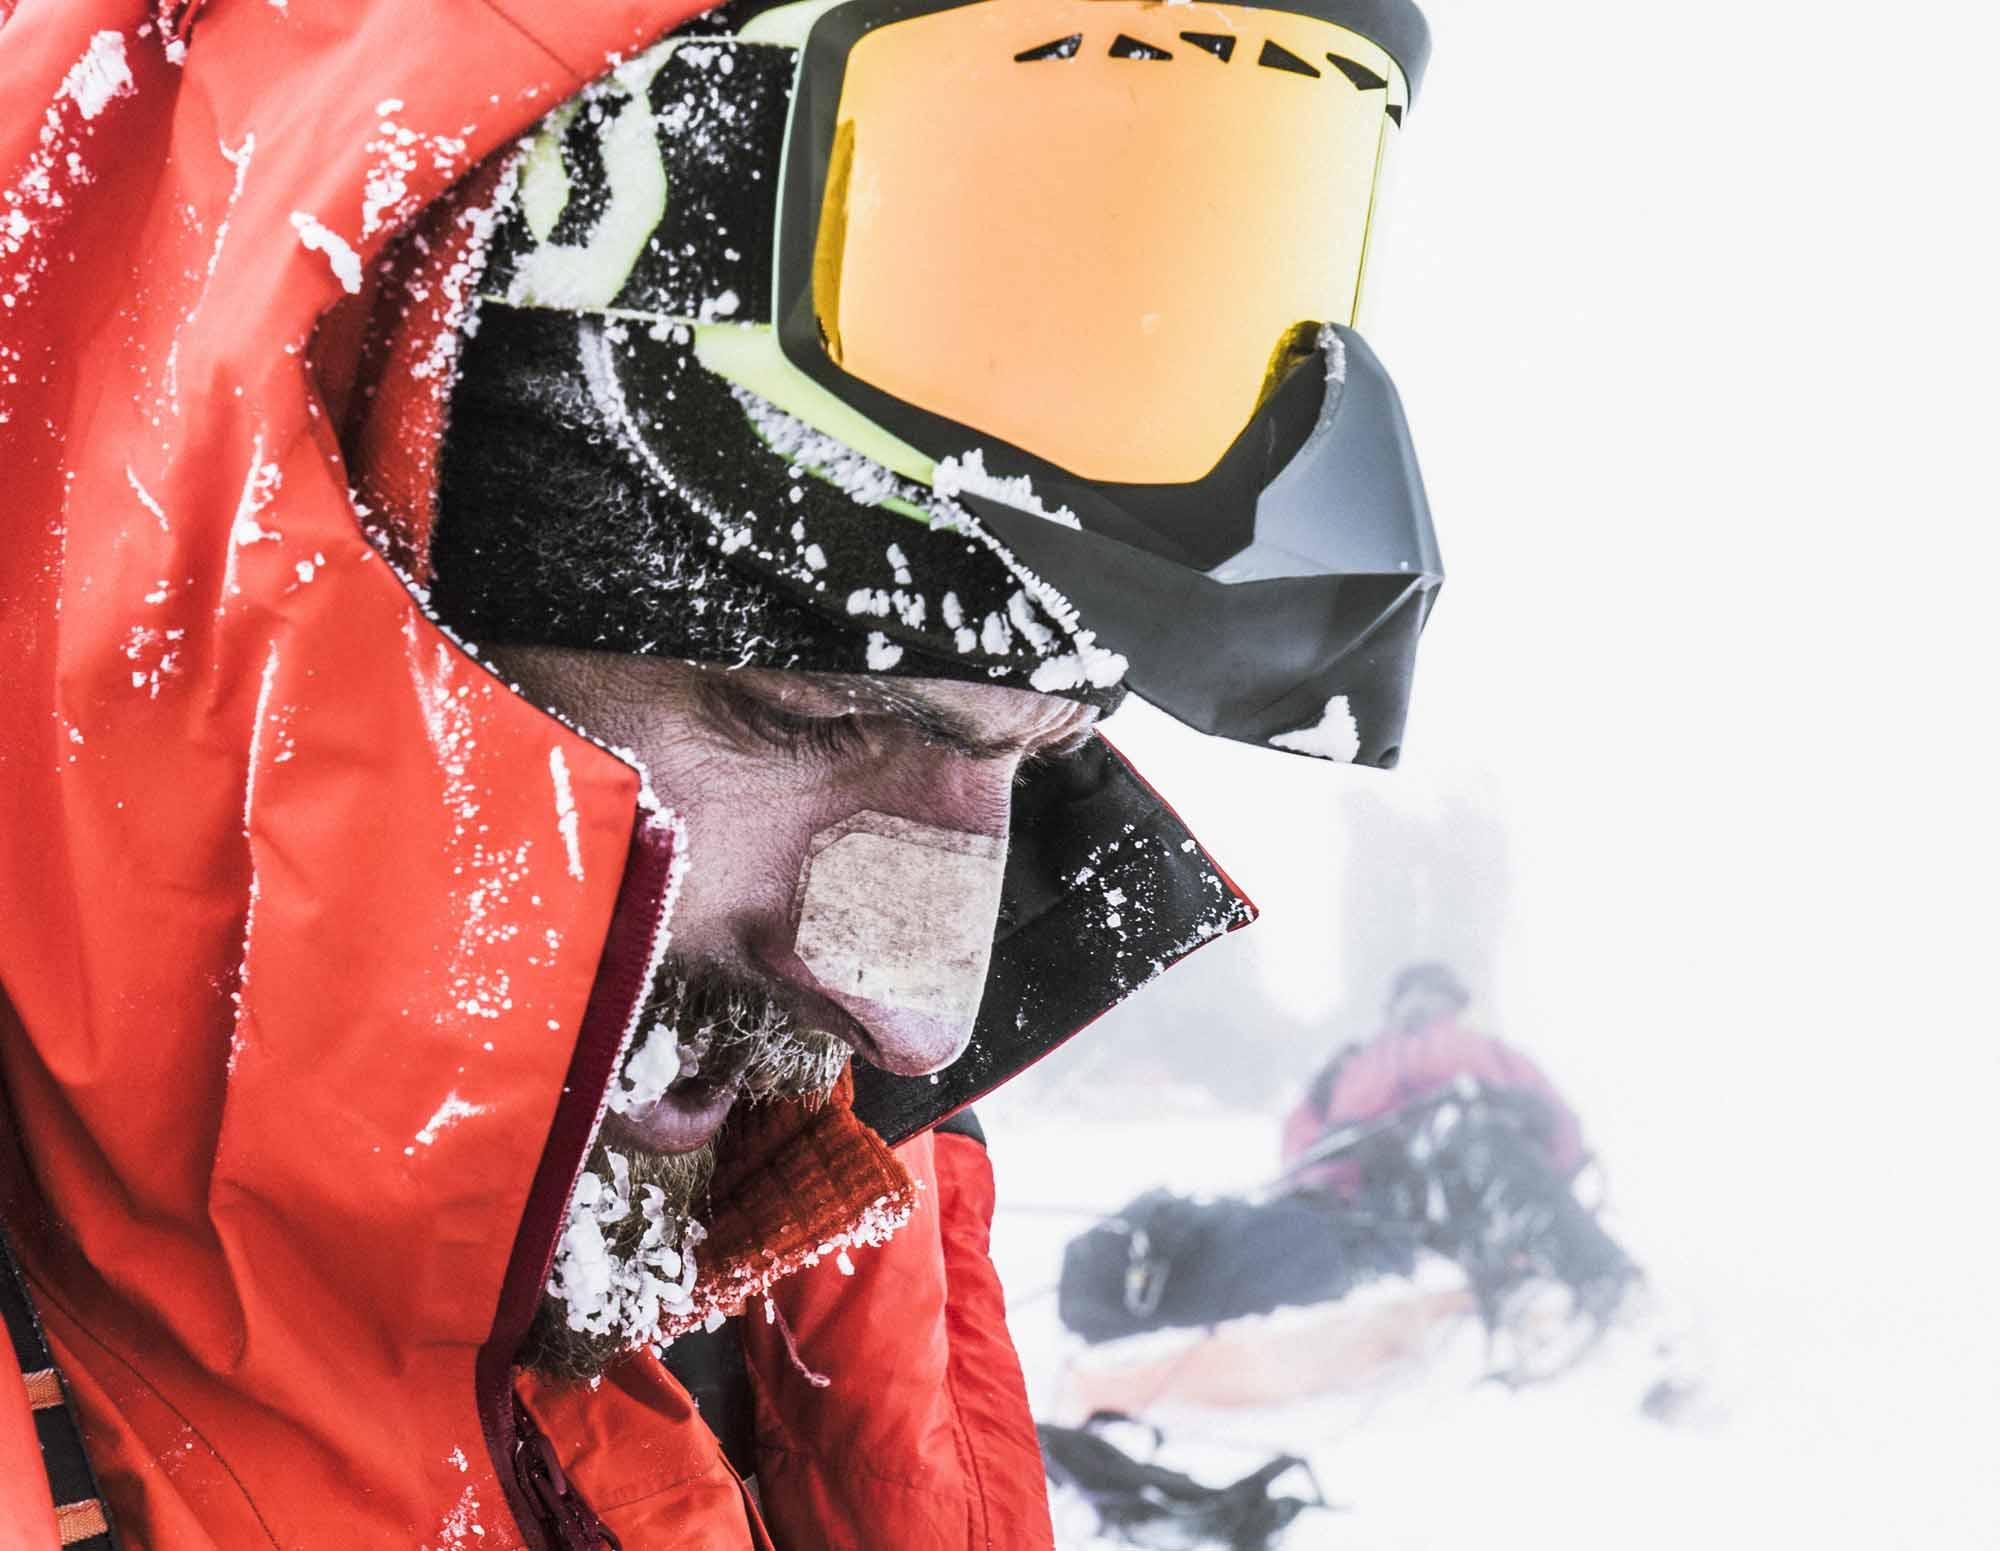 Polar-Quest-Exploration-Polaire-Exploring-Boundaries-in-Antarctica-Caroline-Cote-photo-frostbite-on-nose